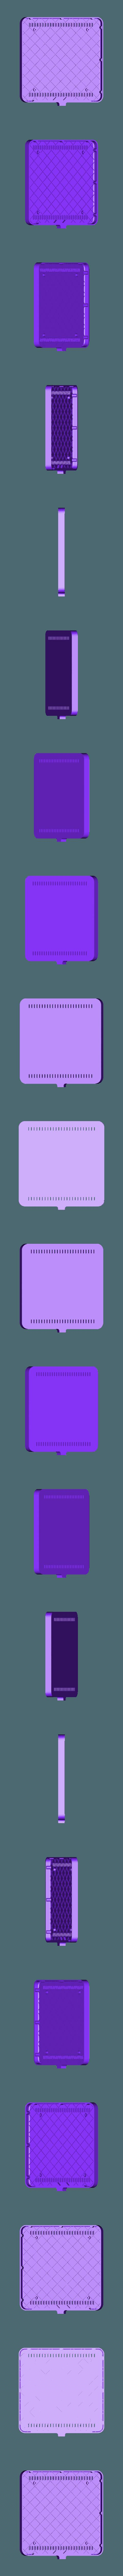 light-box.STL Download free STL file Studio lighting for macro photography (update) • 3D printing template, perinski